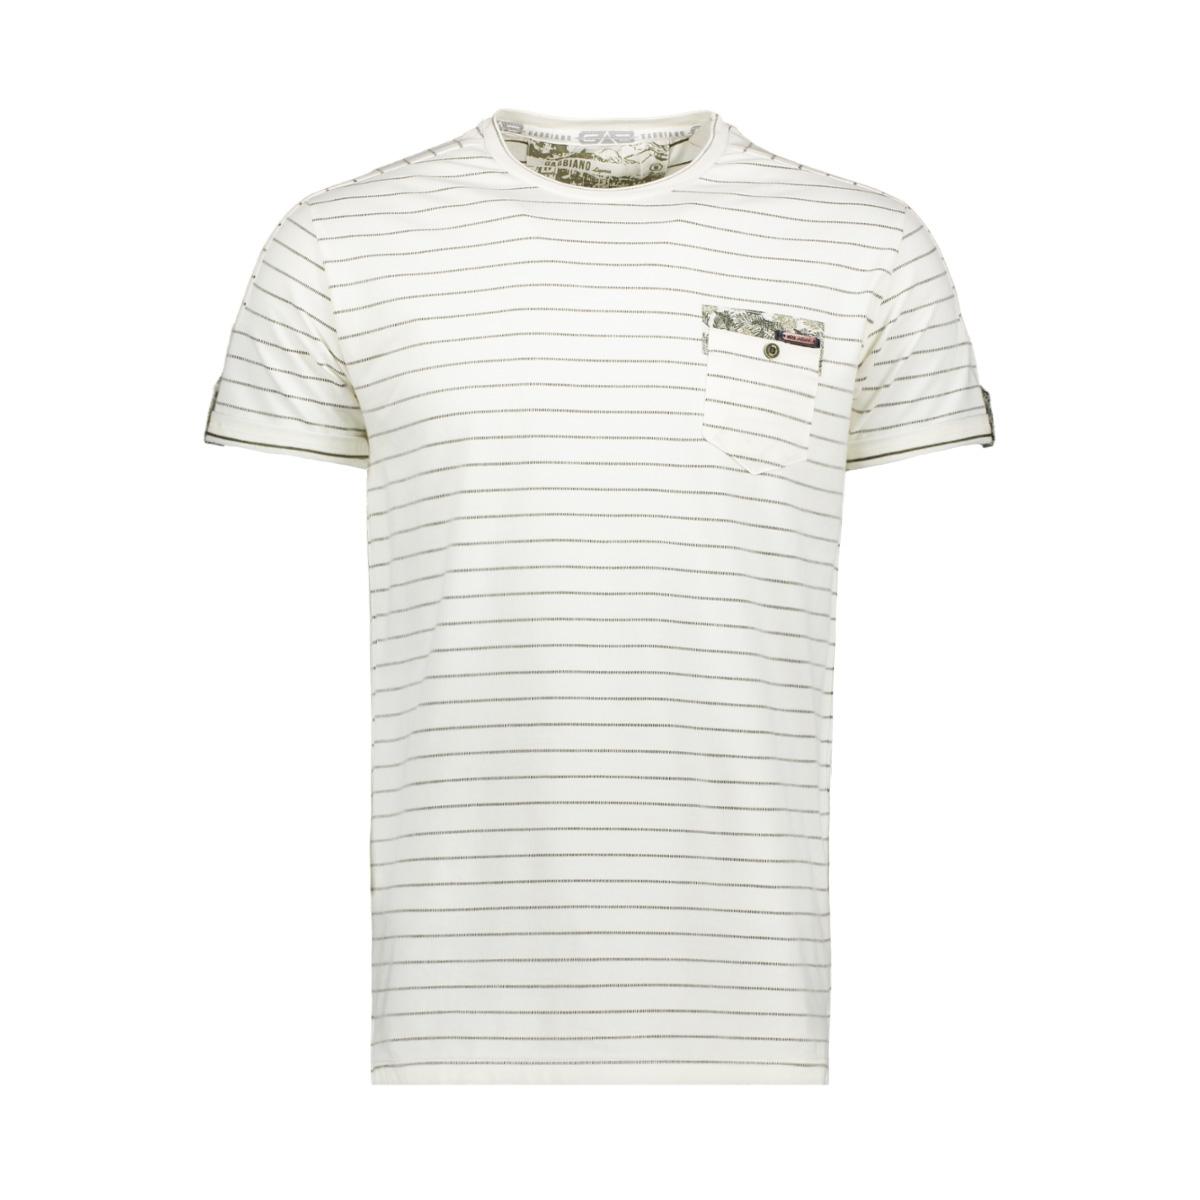 t shirt 15174 gabbiano t-shirt olive